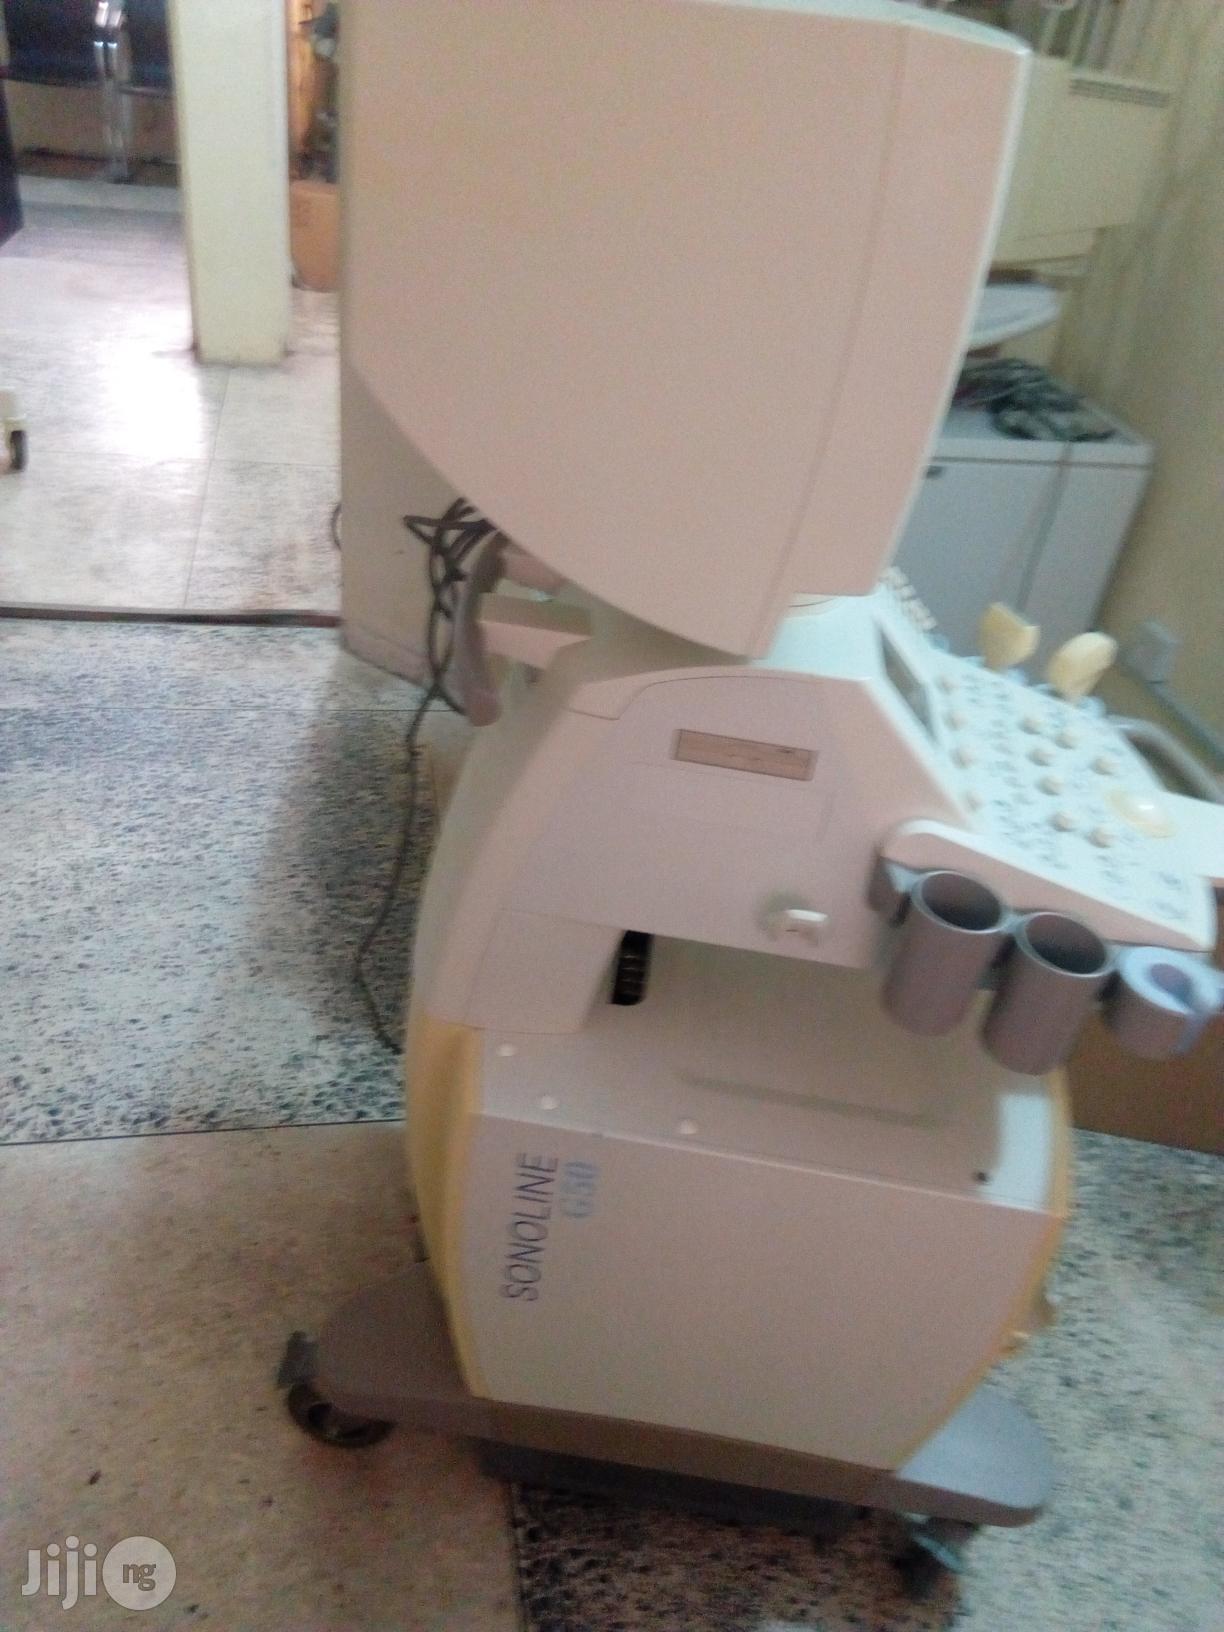 Siemens Sonoline Prima Ultrasound Diagnostic System Sonoline G50 3D